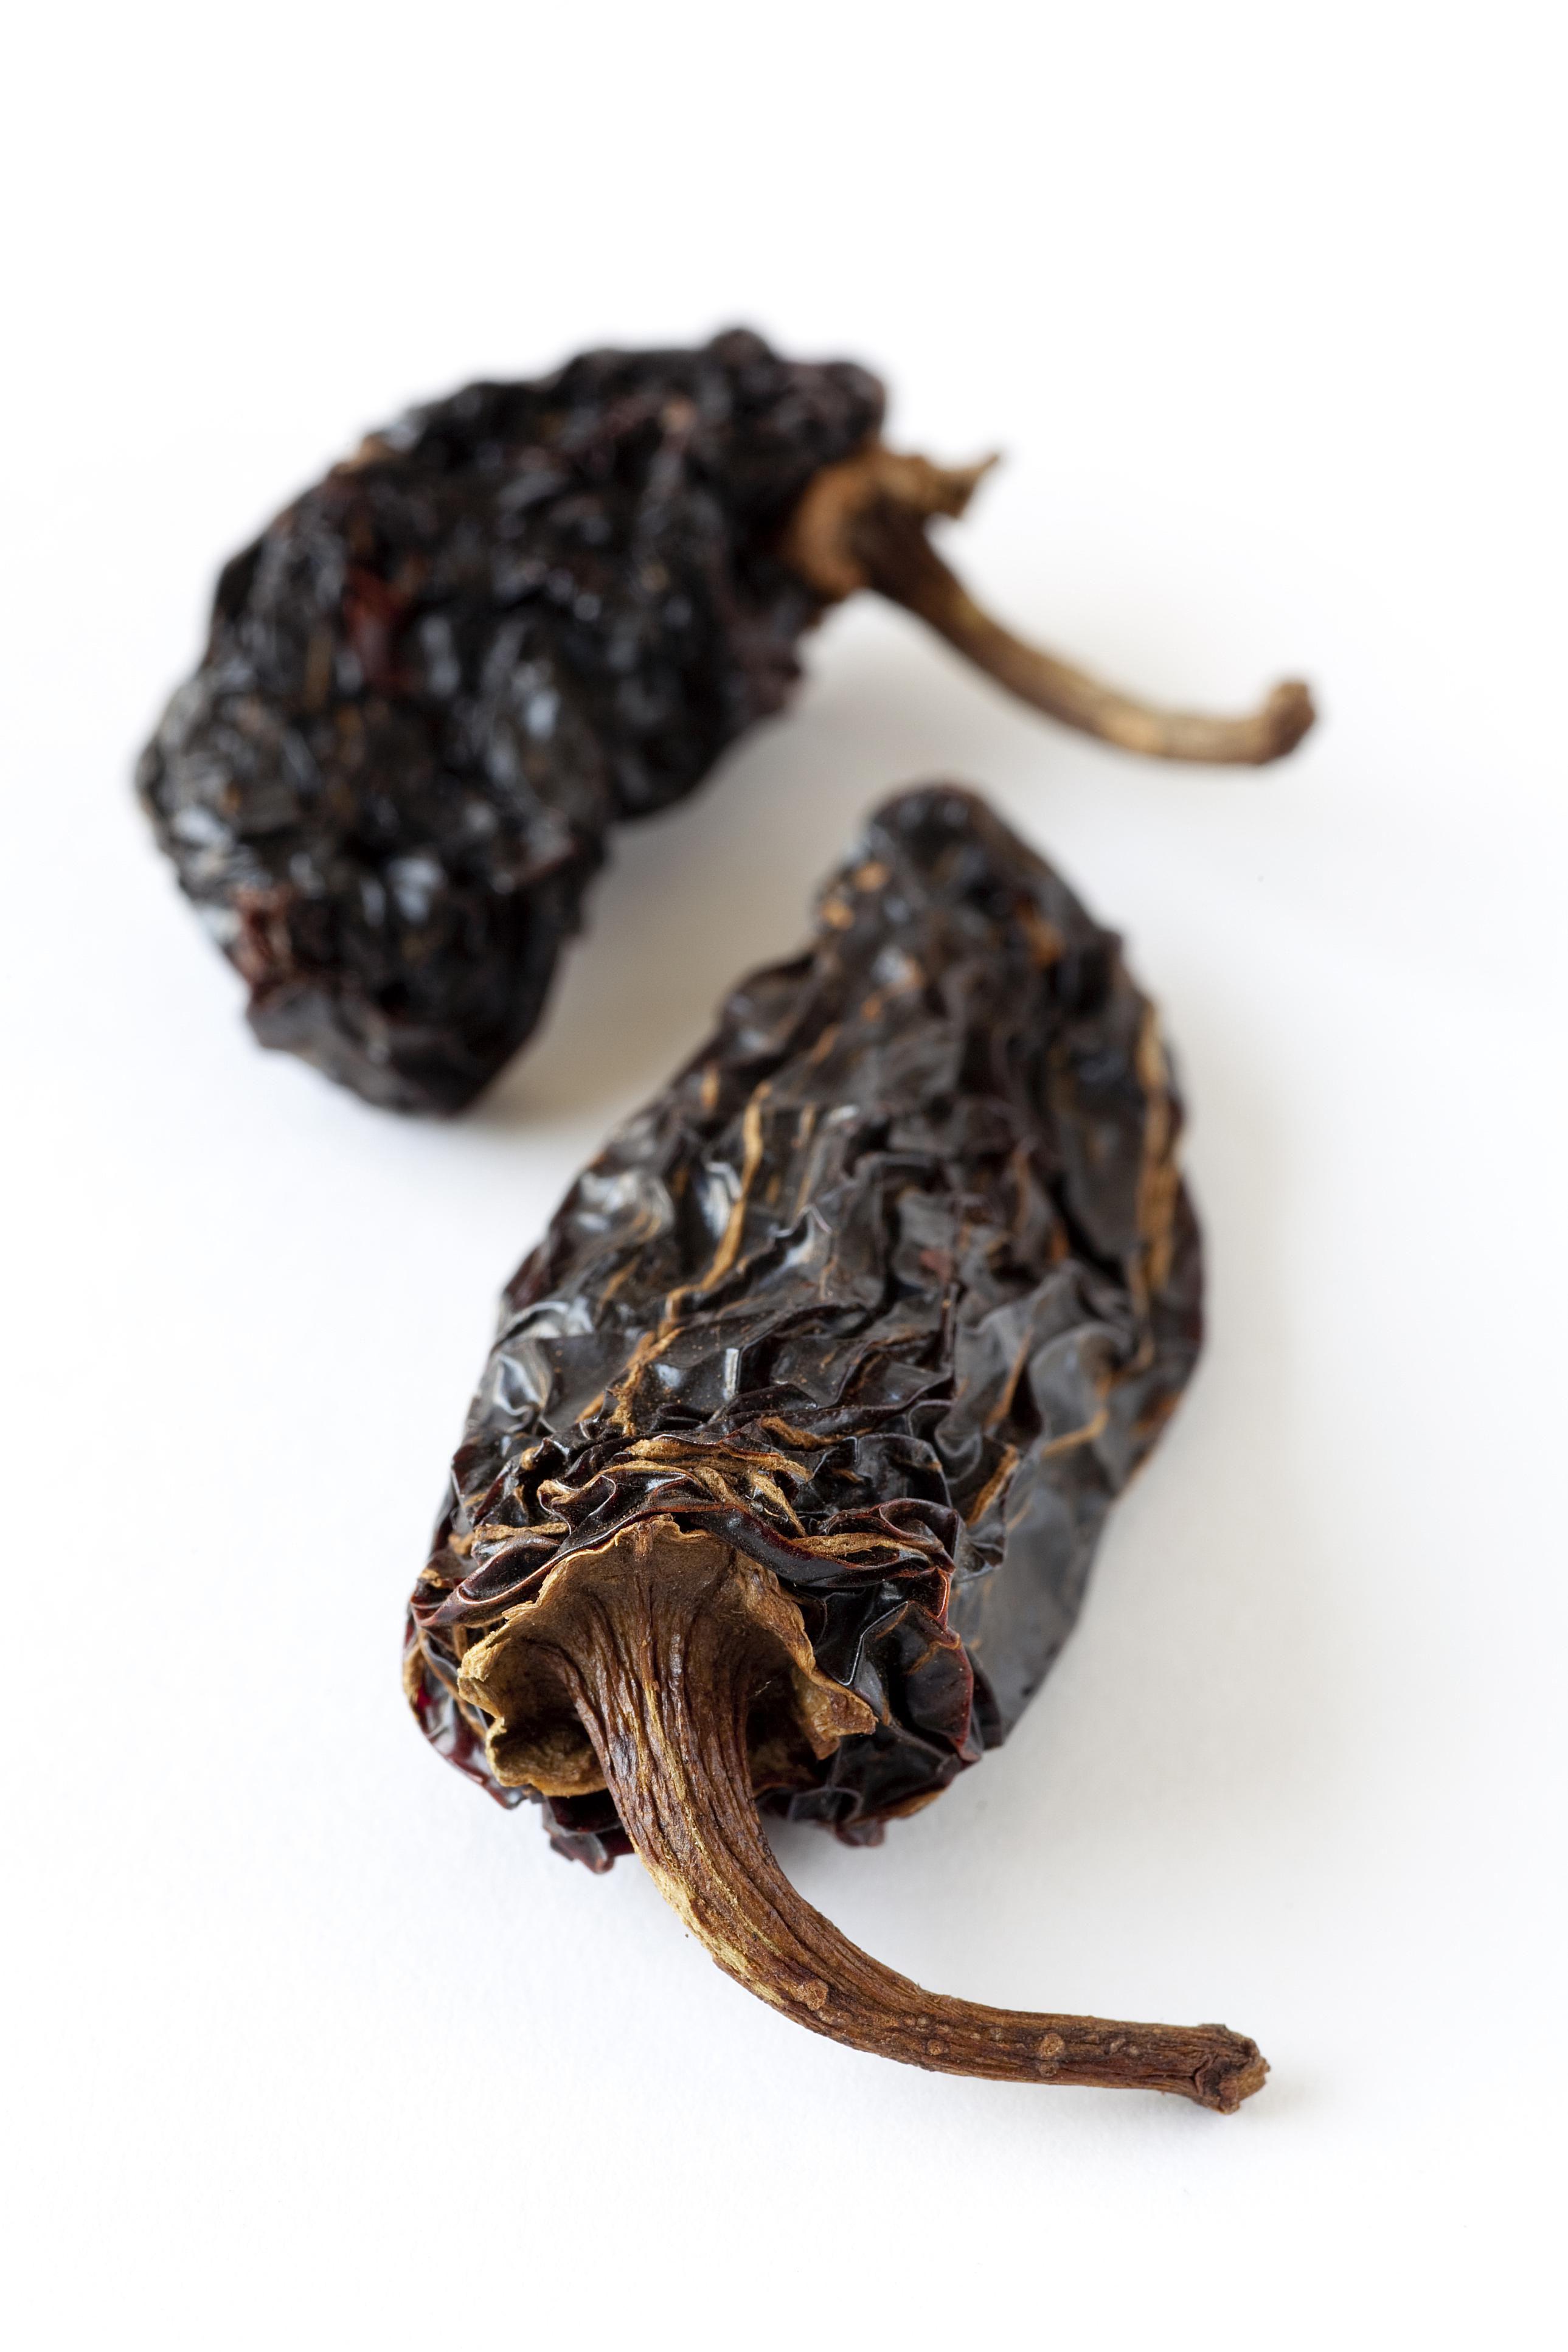 homemade smoked chipotle recipe